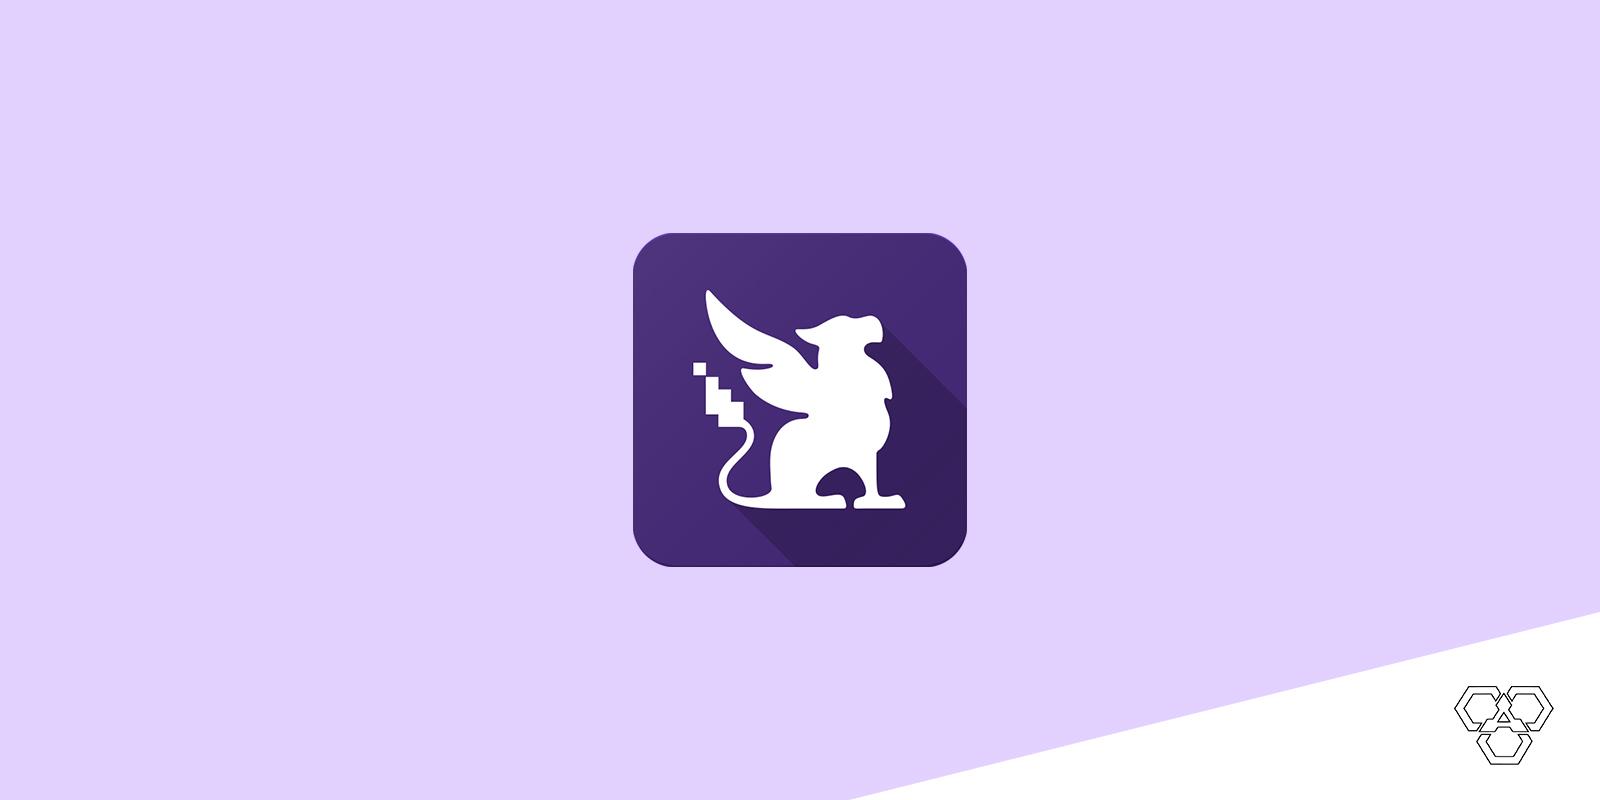 Habitica apps